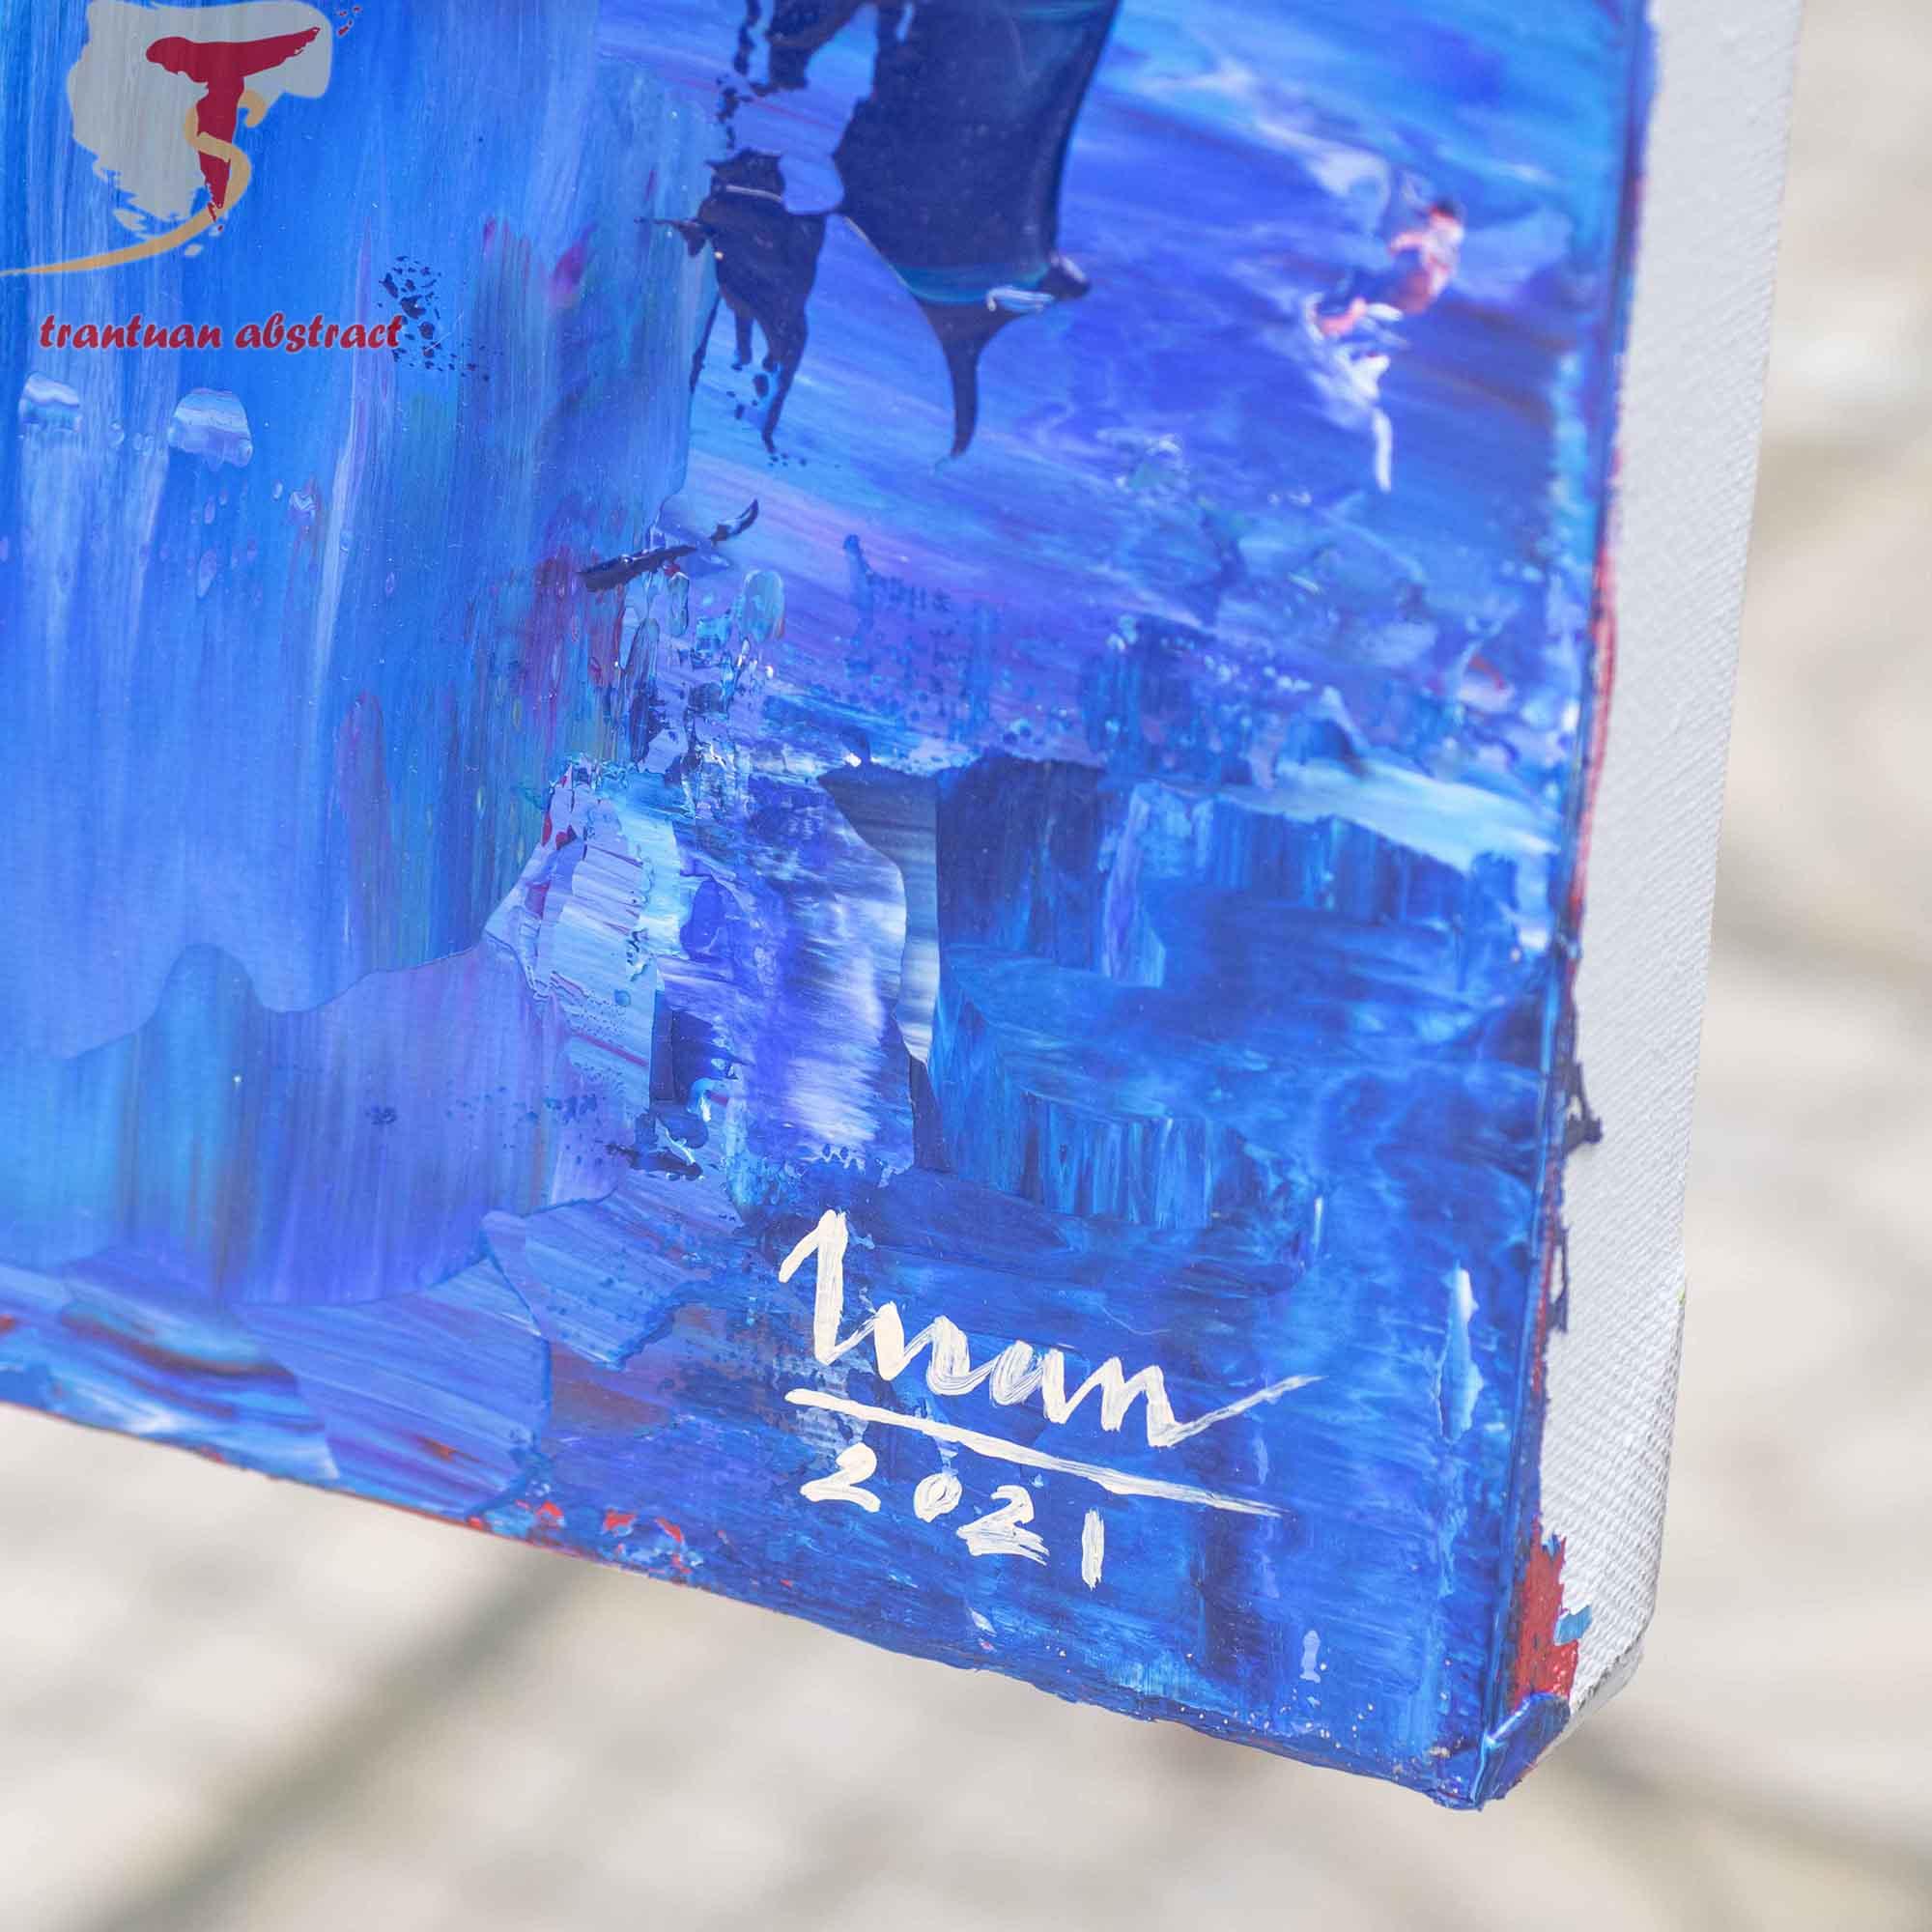 Tran Tuan Abstract Mysterious Stillness 2021 135 x 80 x 5 cm Acrylic on Canvas Painting Detail